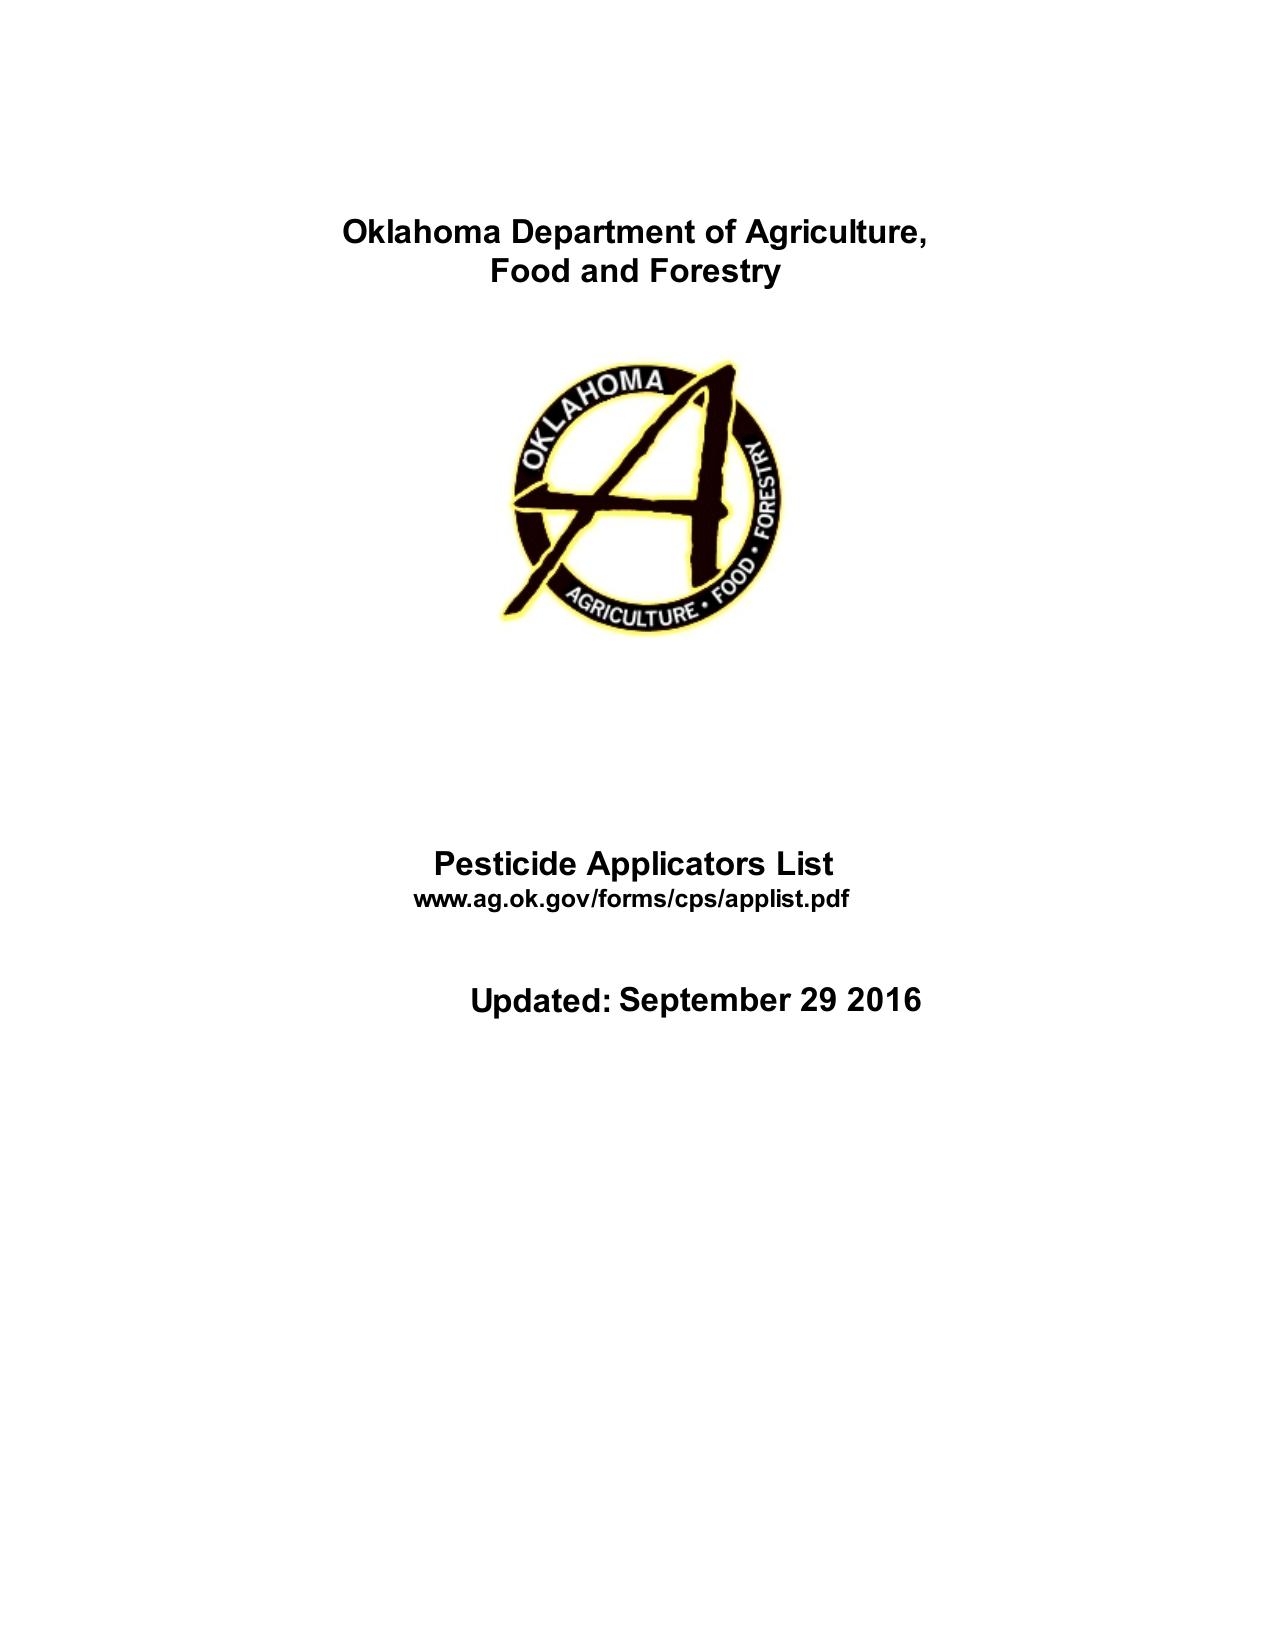 Pesticide Applicators List